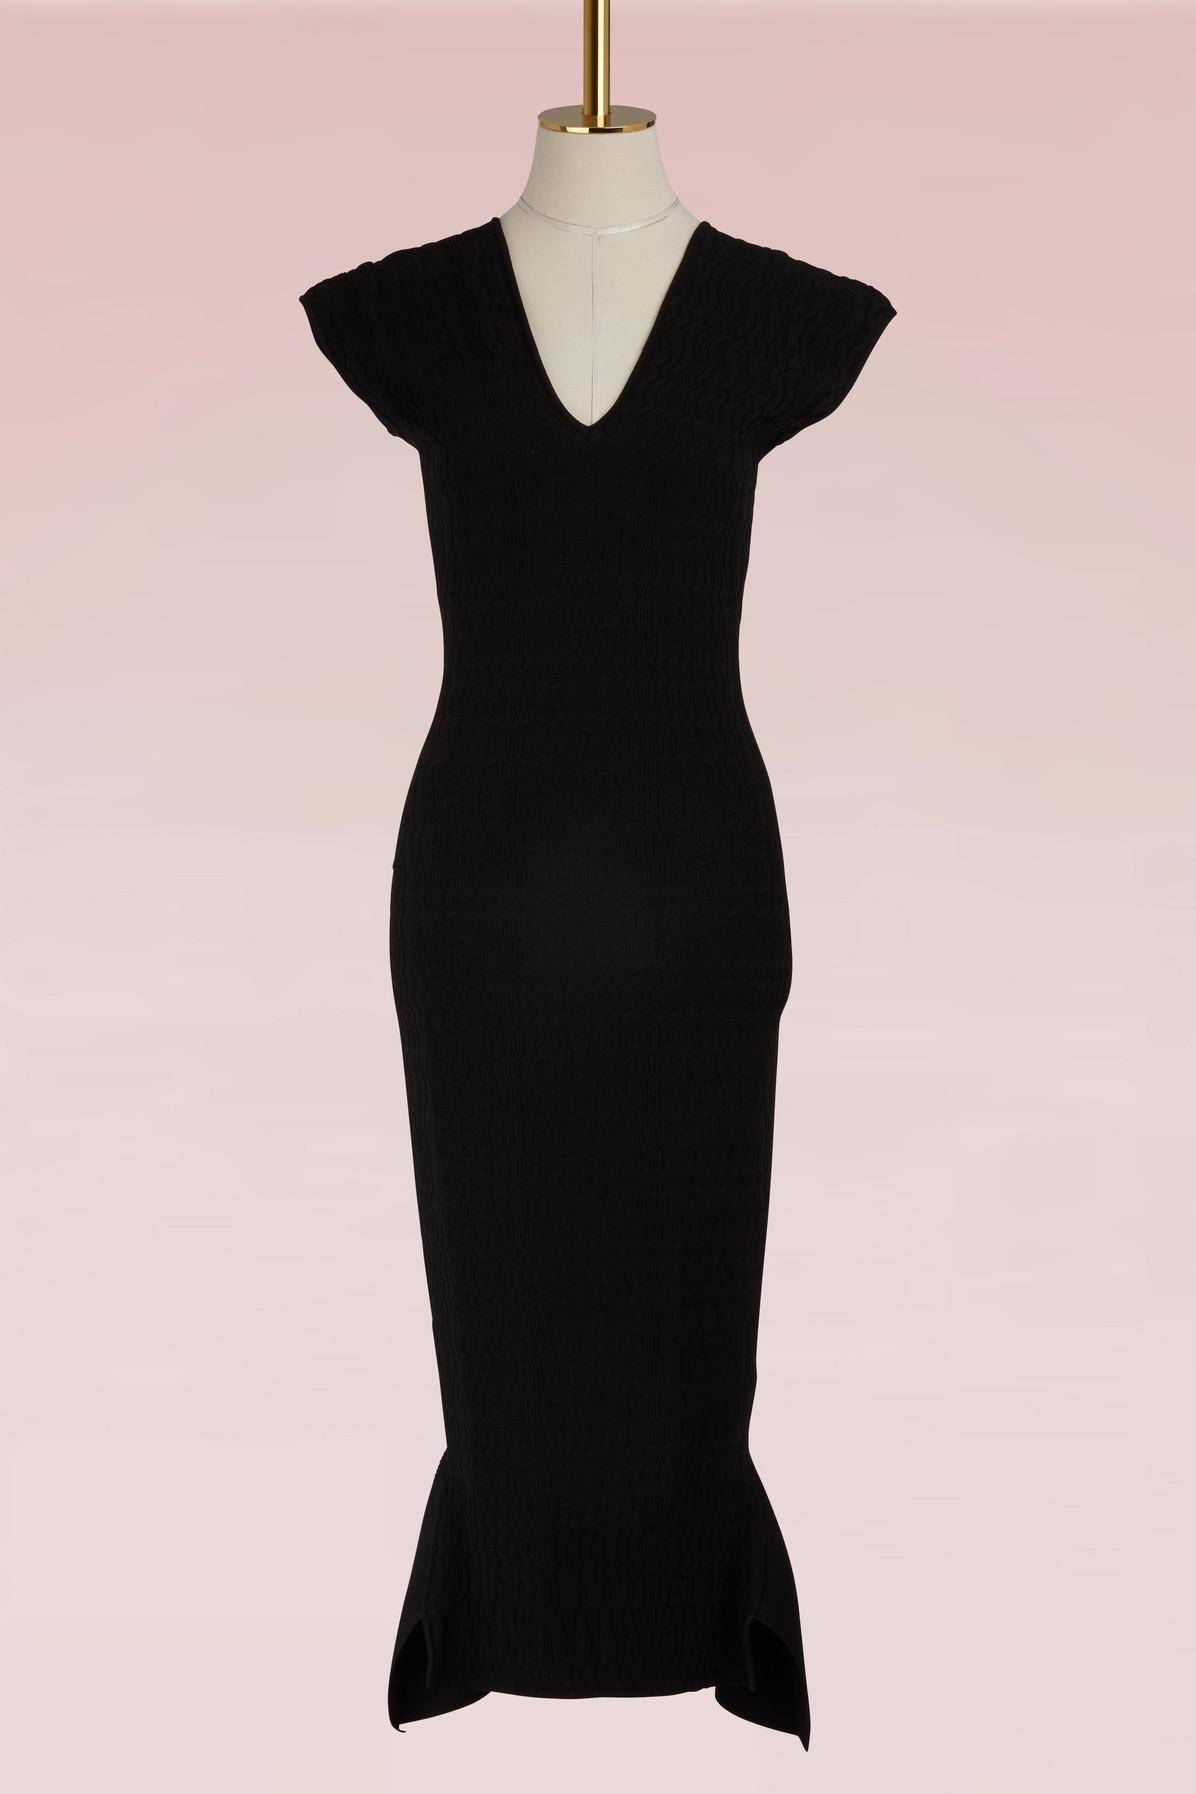 100% Authentic Cheap Online Stockcross Dress Roland Mouret Discount Cheap Online Ogjufeu